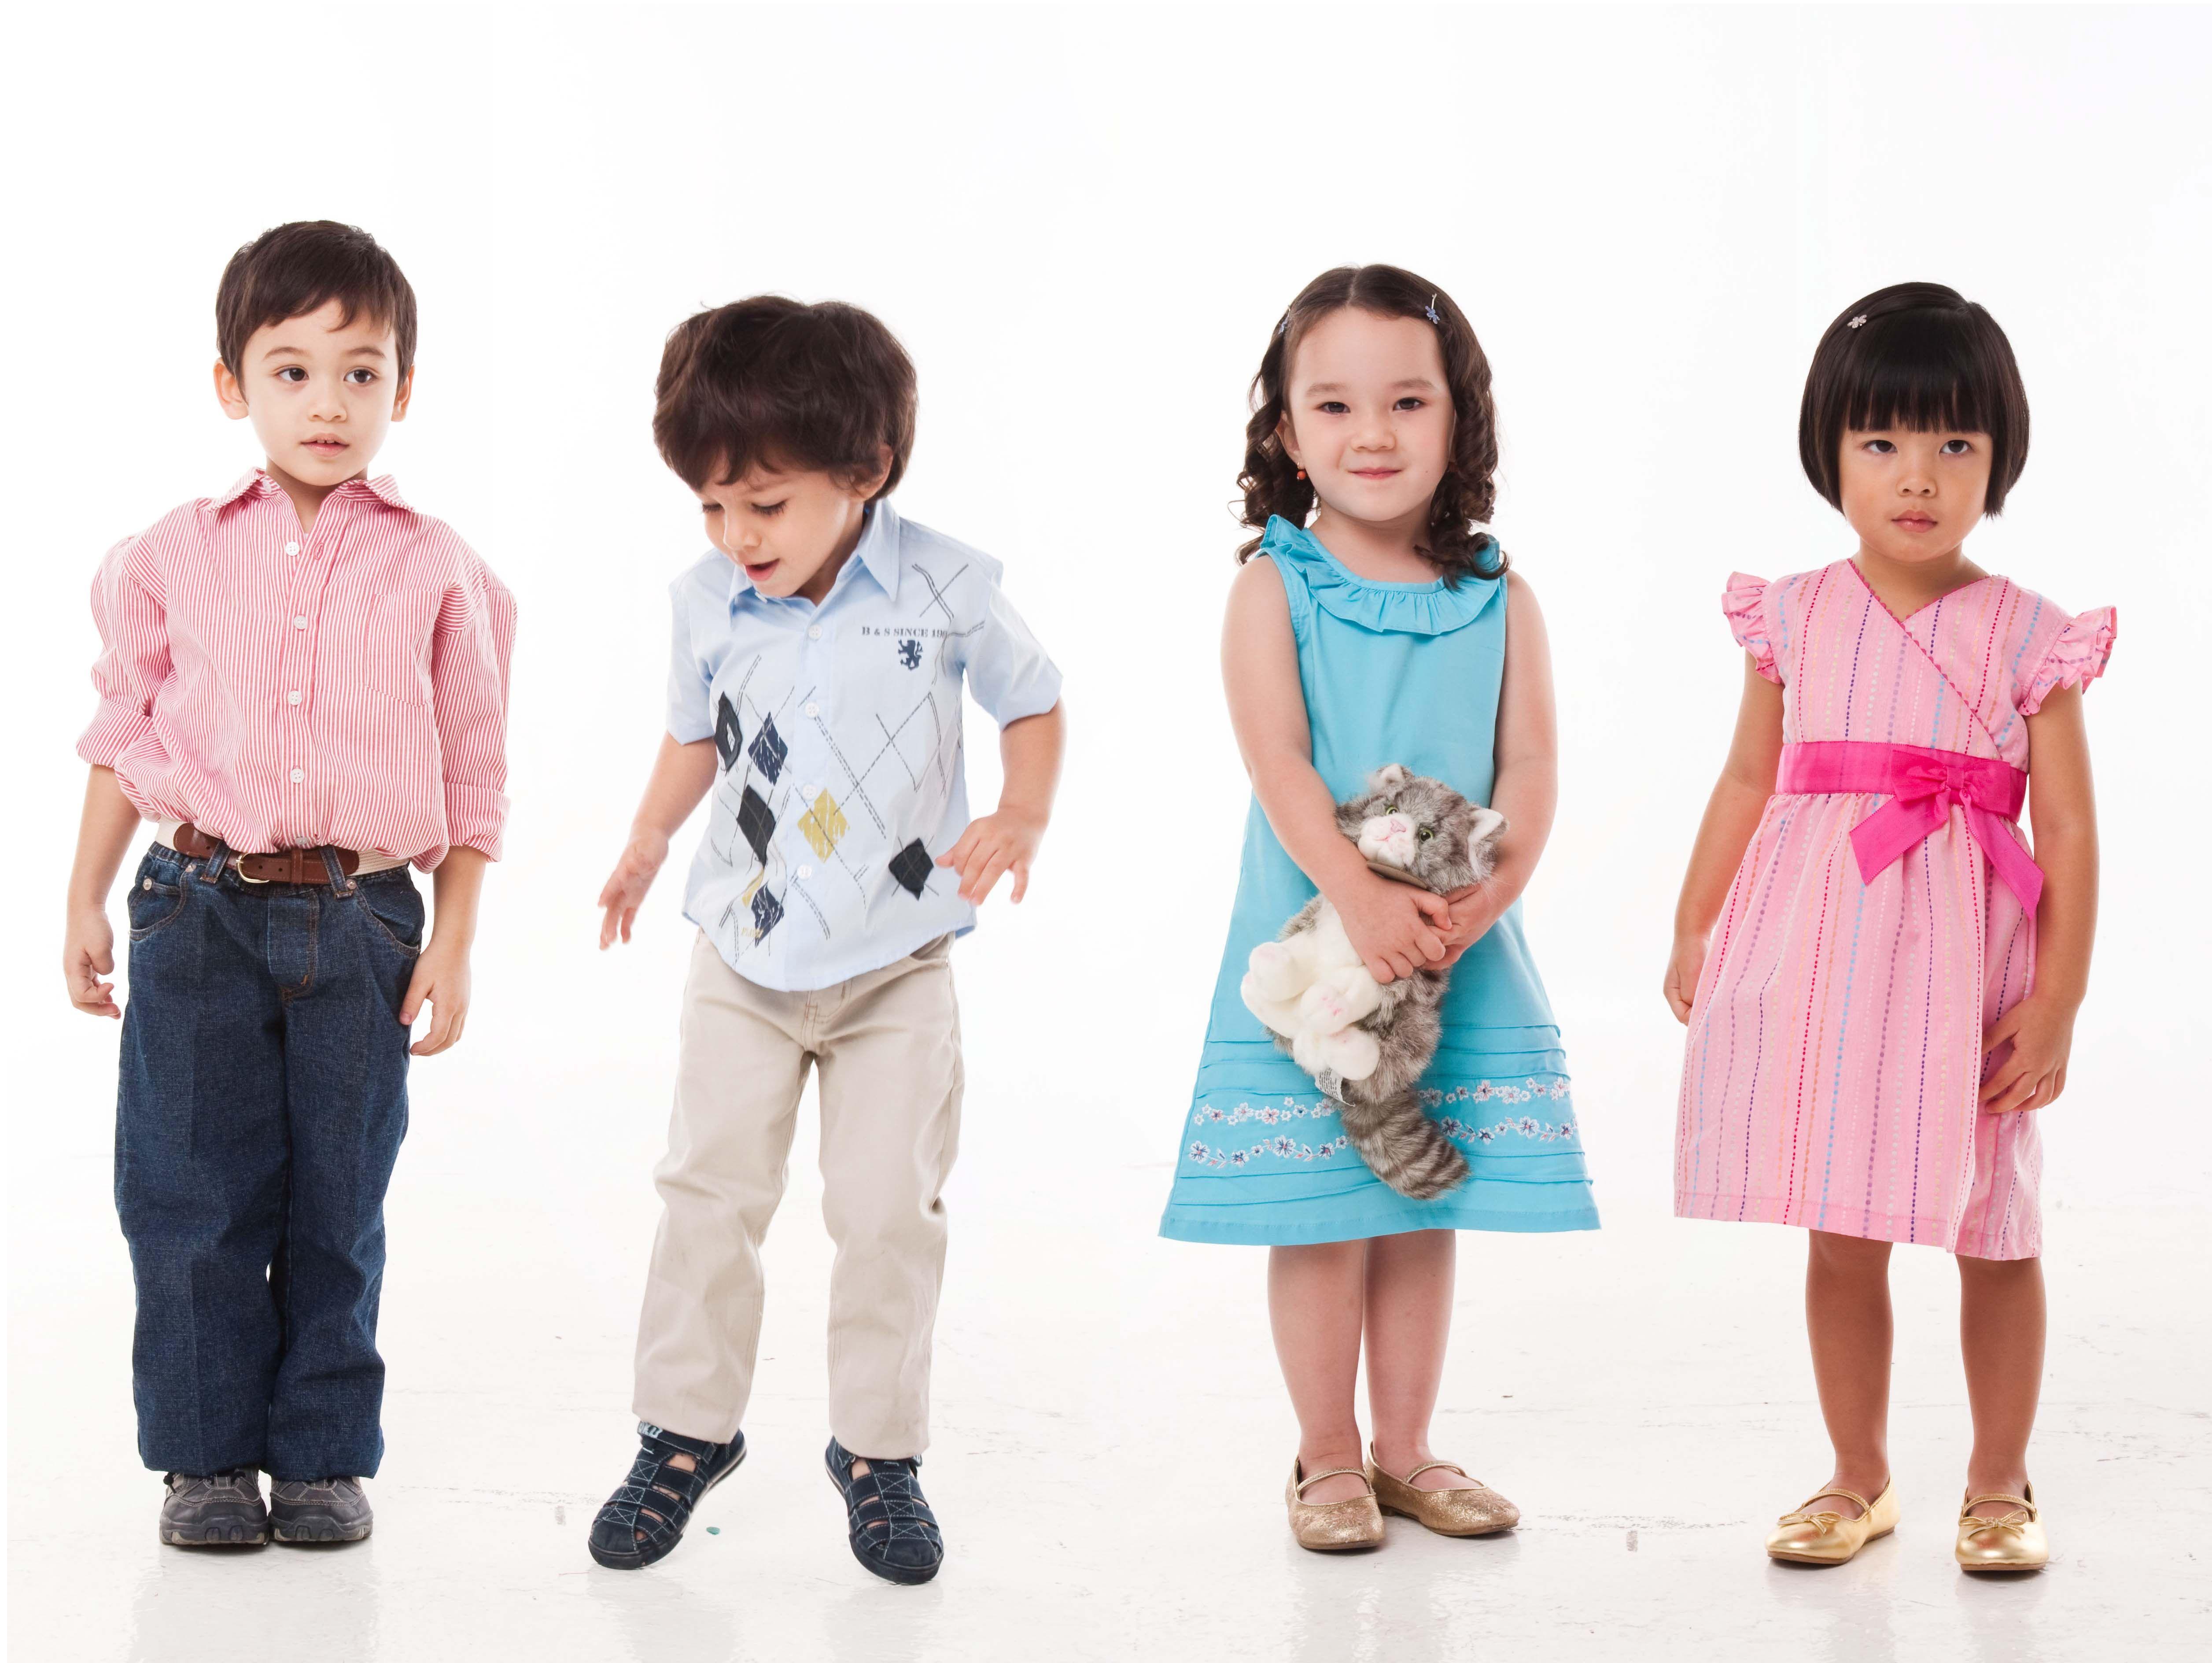 5 Best Kids Clothing Brands New Kids Center